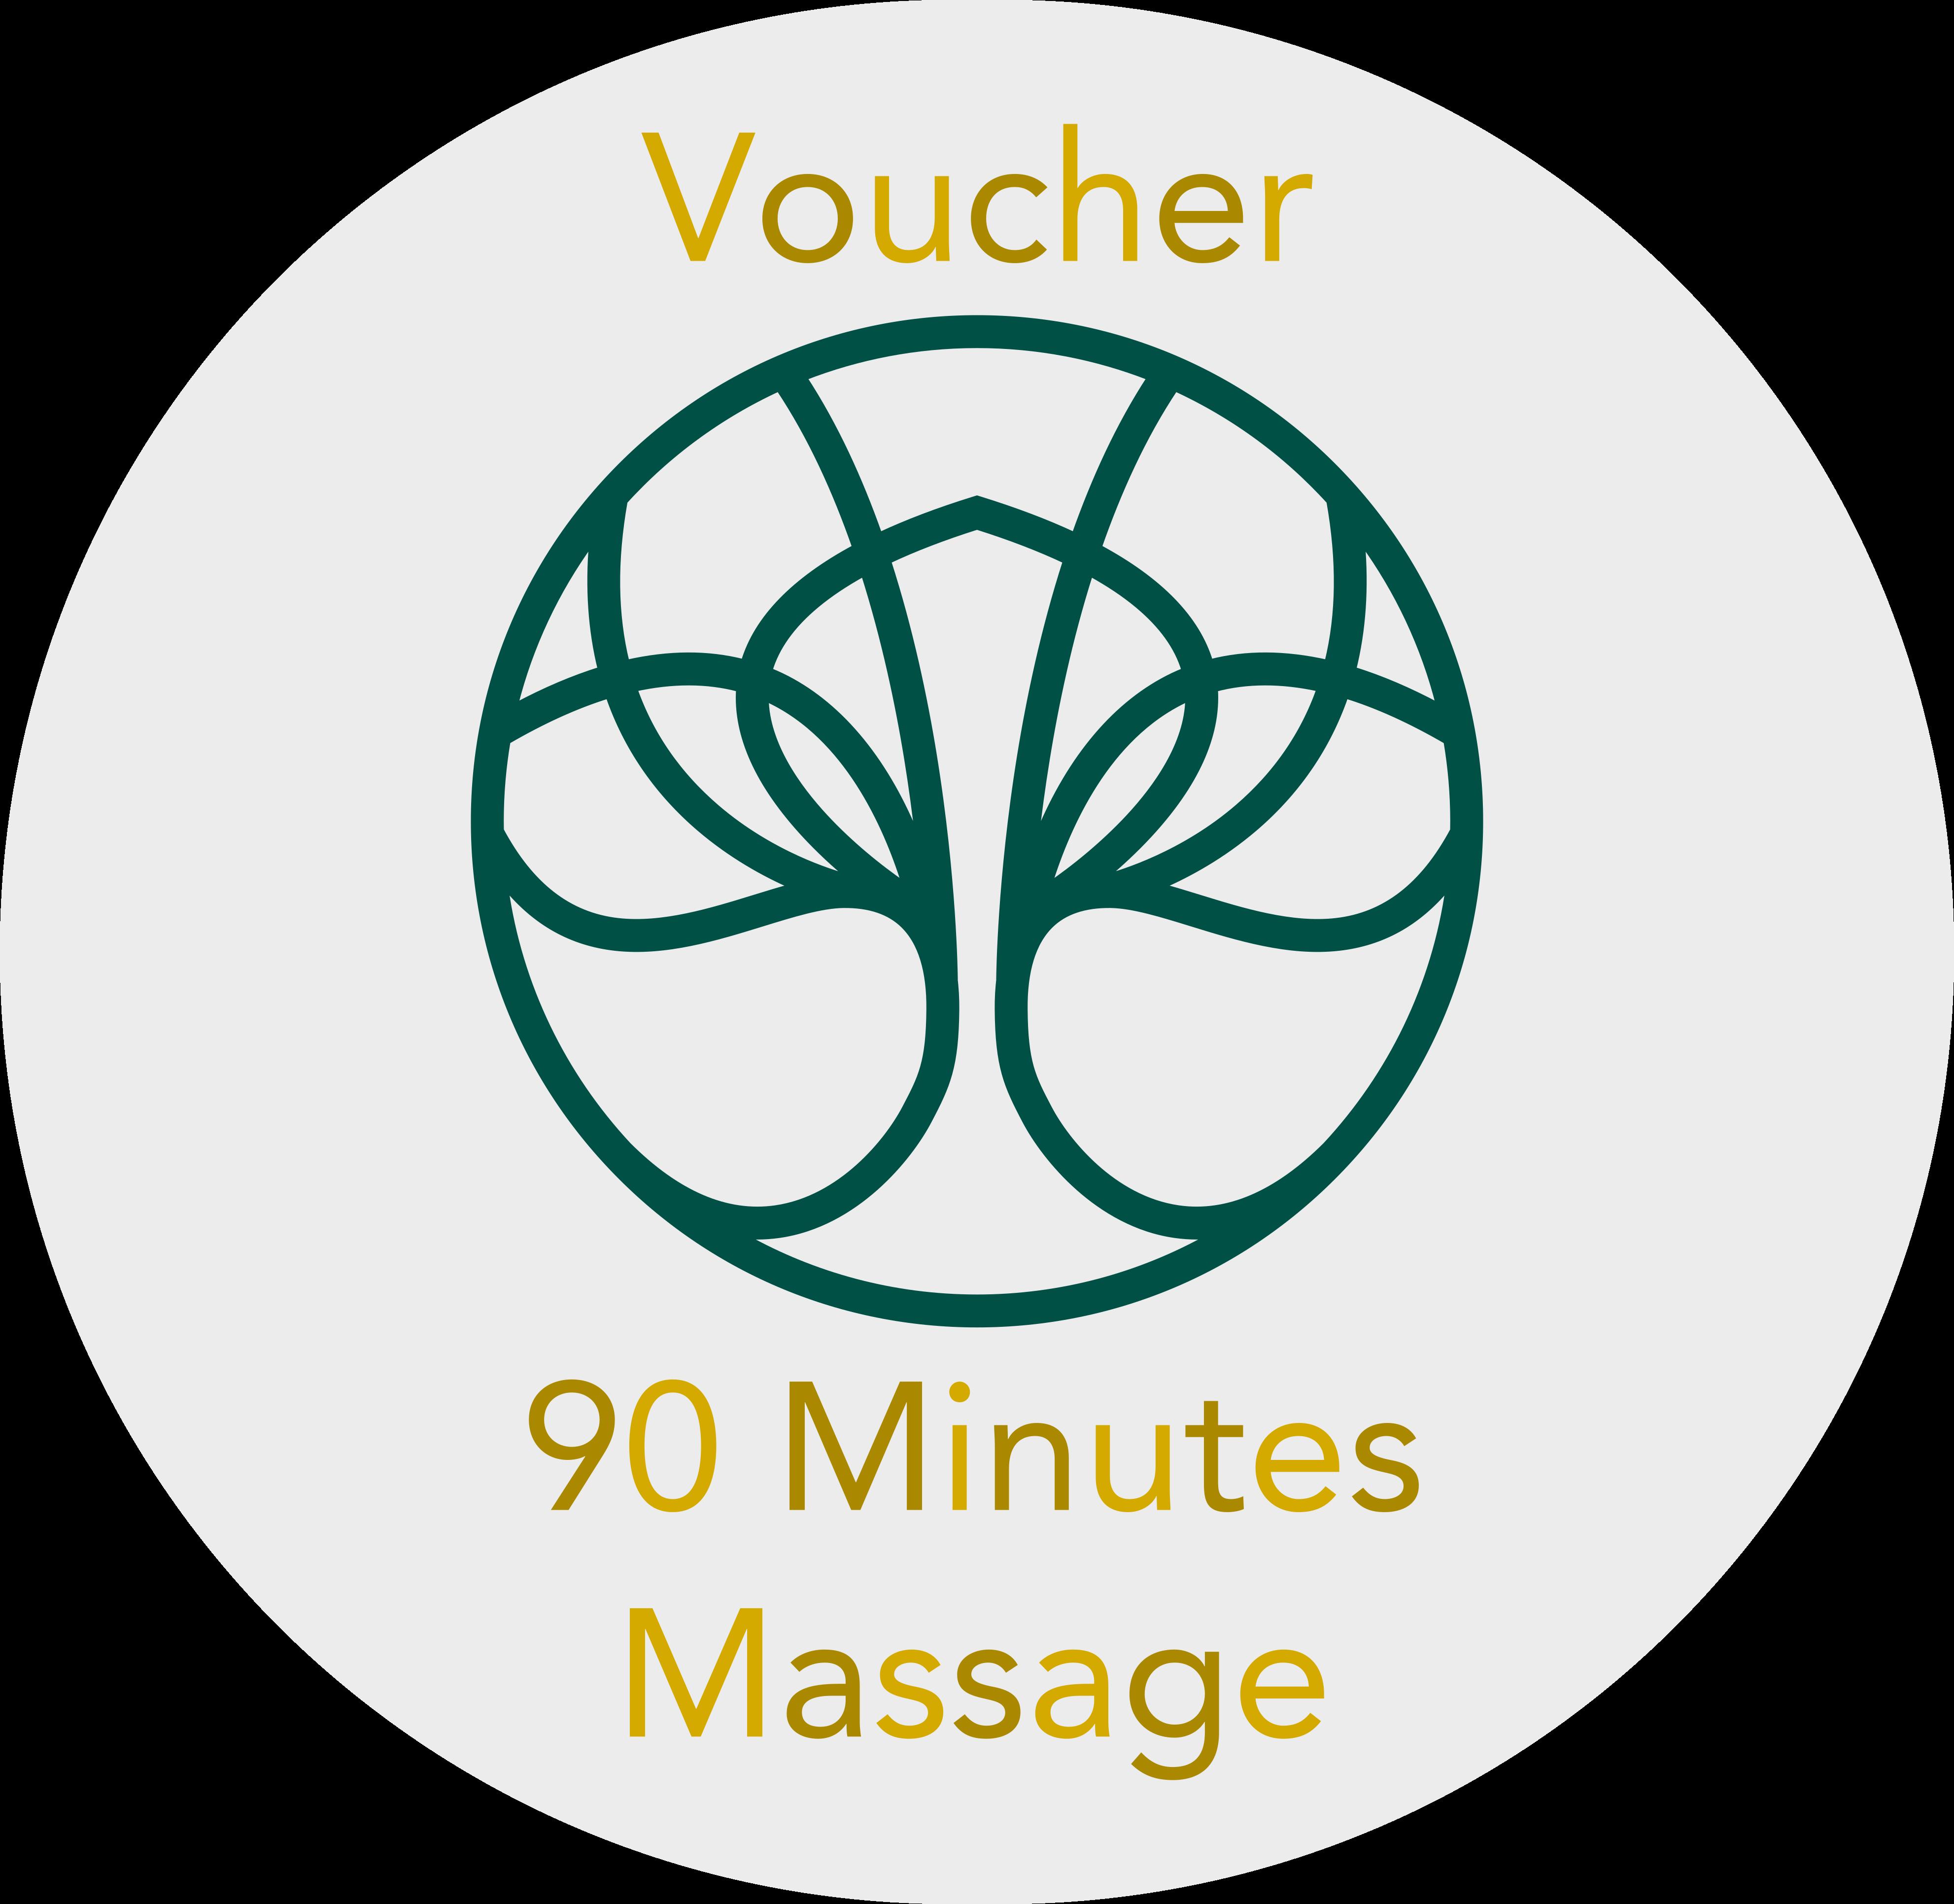 Voucher 90 Min Massage